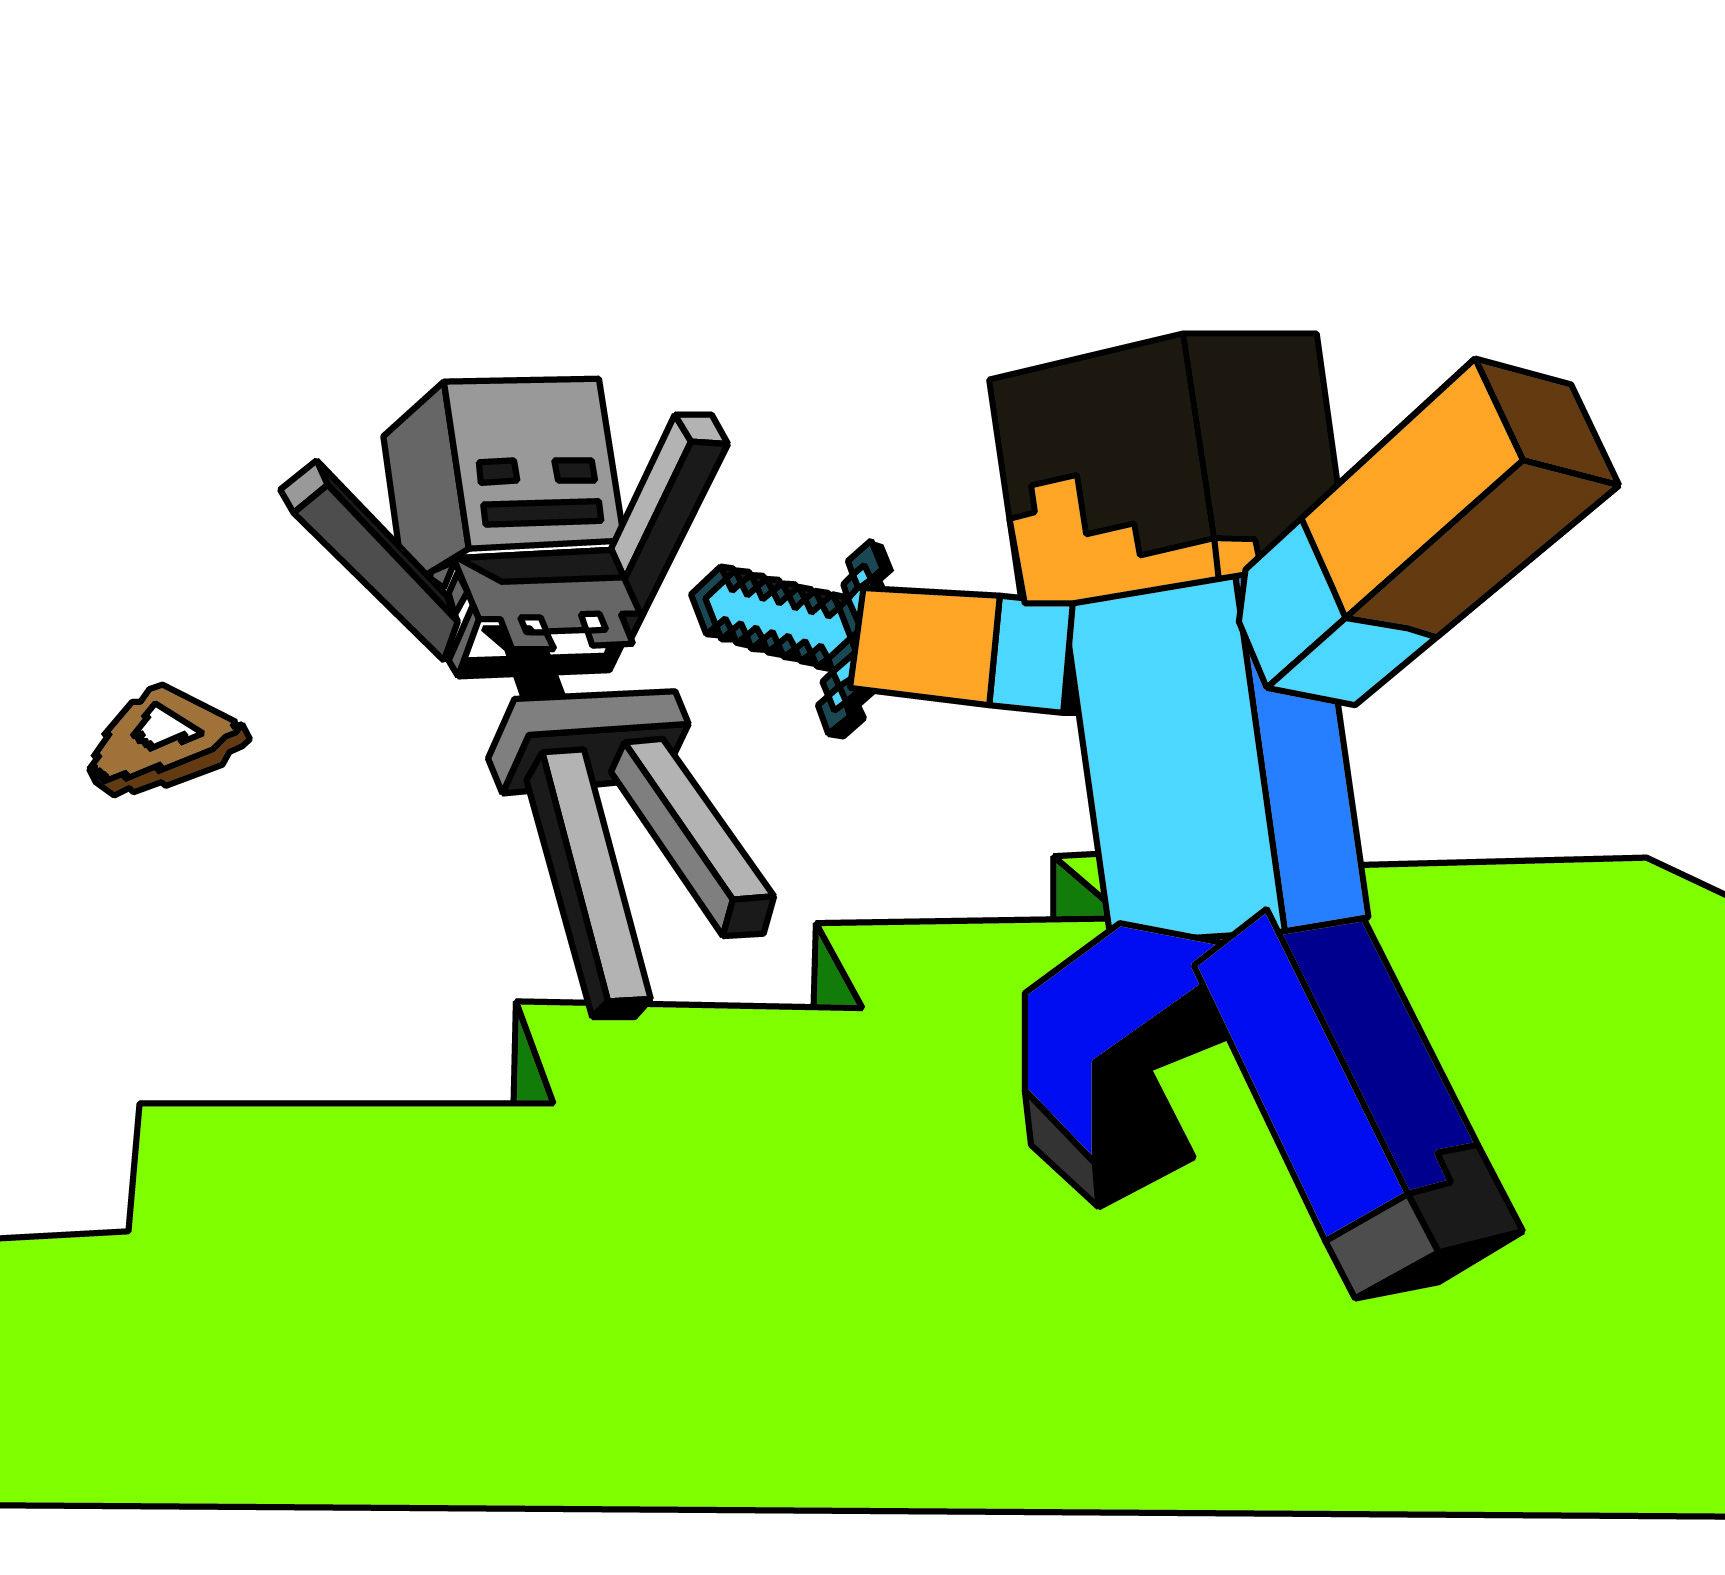 Minecraft on minecraft minecraft blanket and coloring,minecraft ...